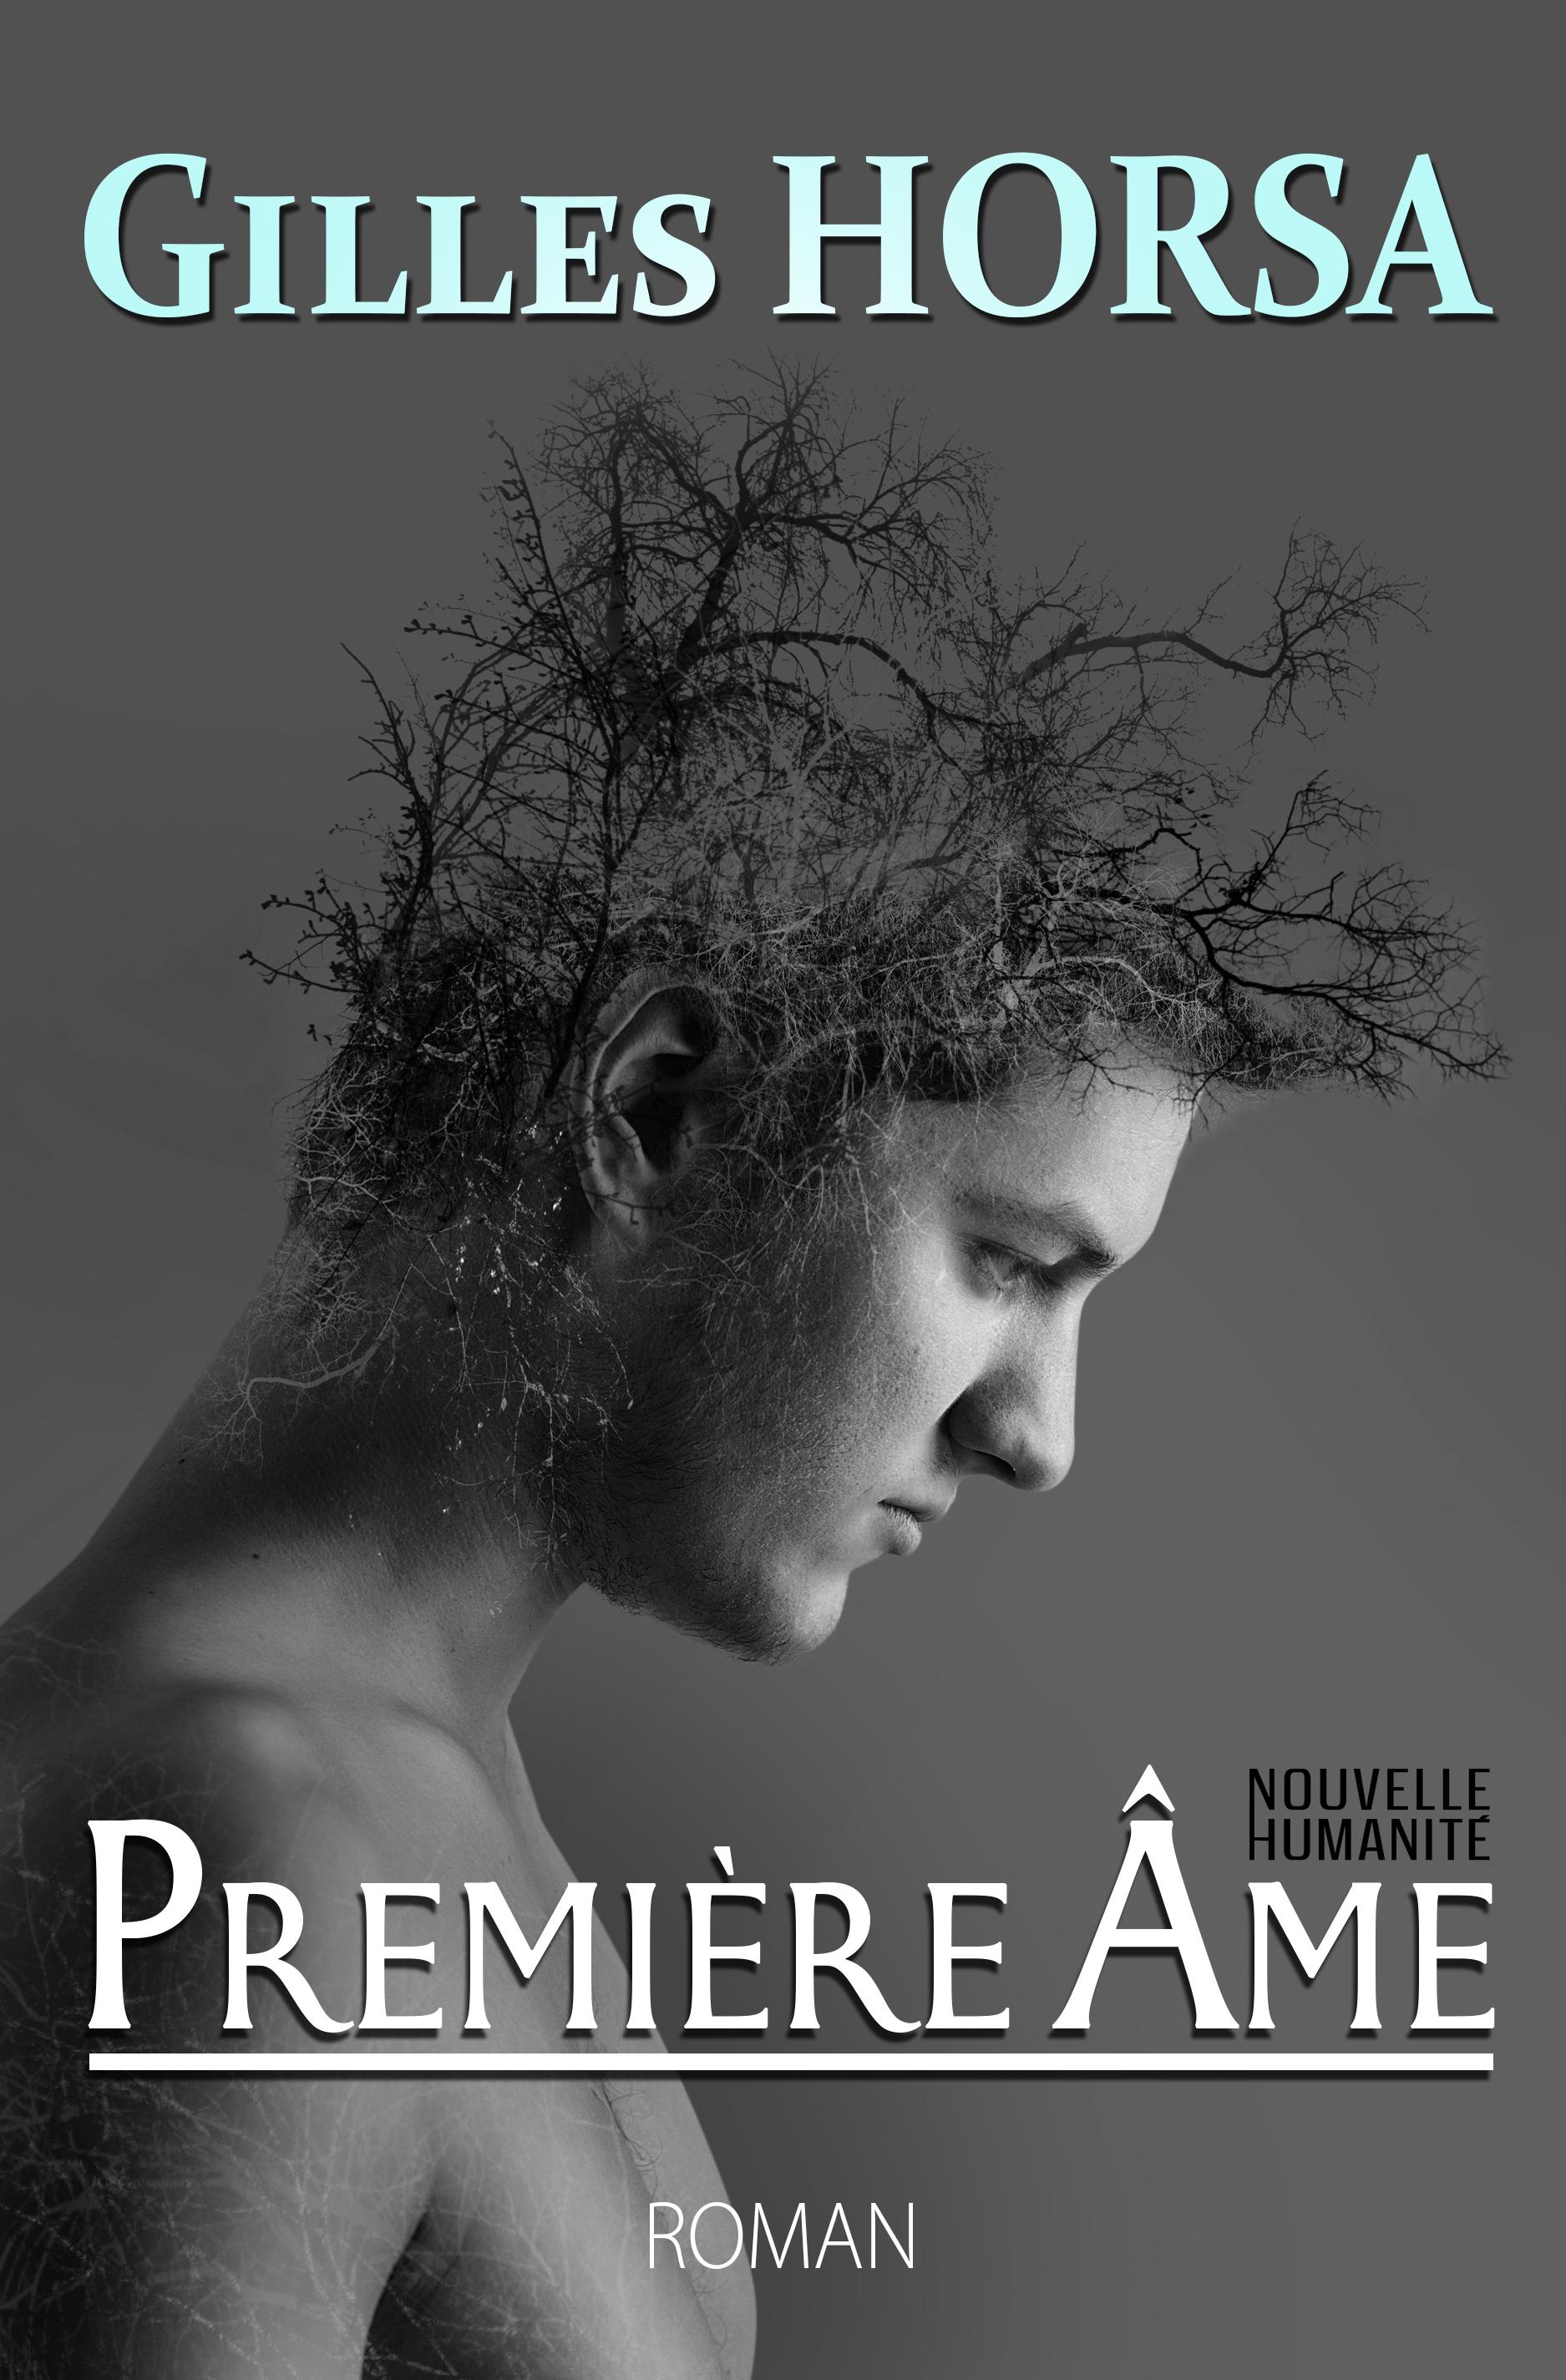 PREMIERE AME - NOUVELLE HUMANITE